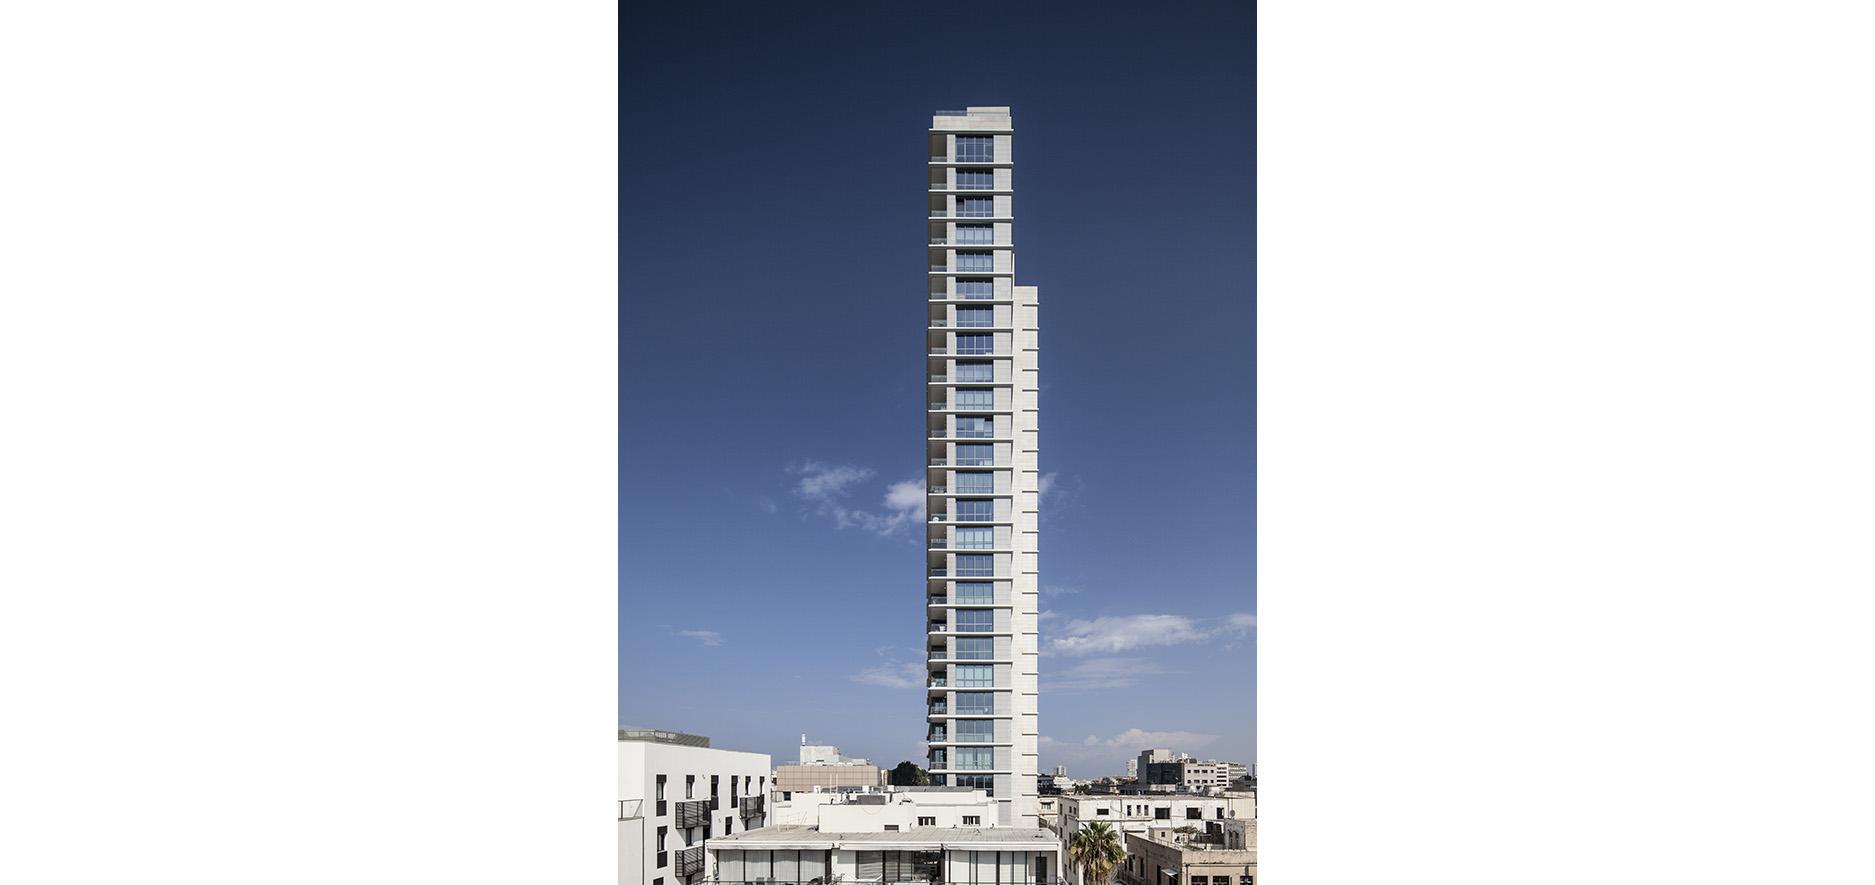 Rothschild_30_Tower_Tel_Aviv_planned_By_Kolker_Epstein_Architects1